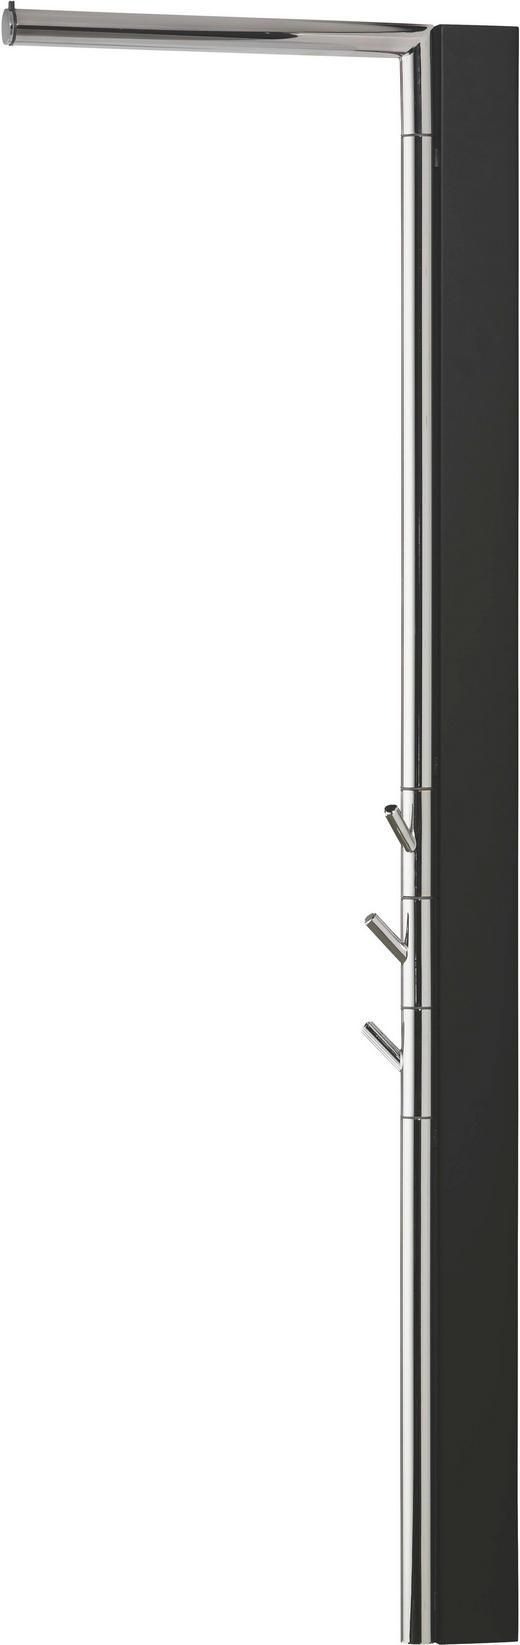 WANDGARDEROBE Buche massiv Schwarz - Schwarz, MODERN, Holz (2,5(35)/120/38,5cm)